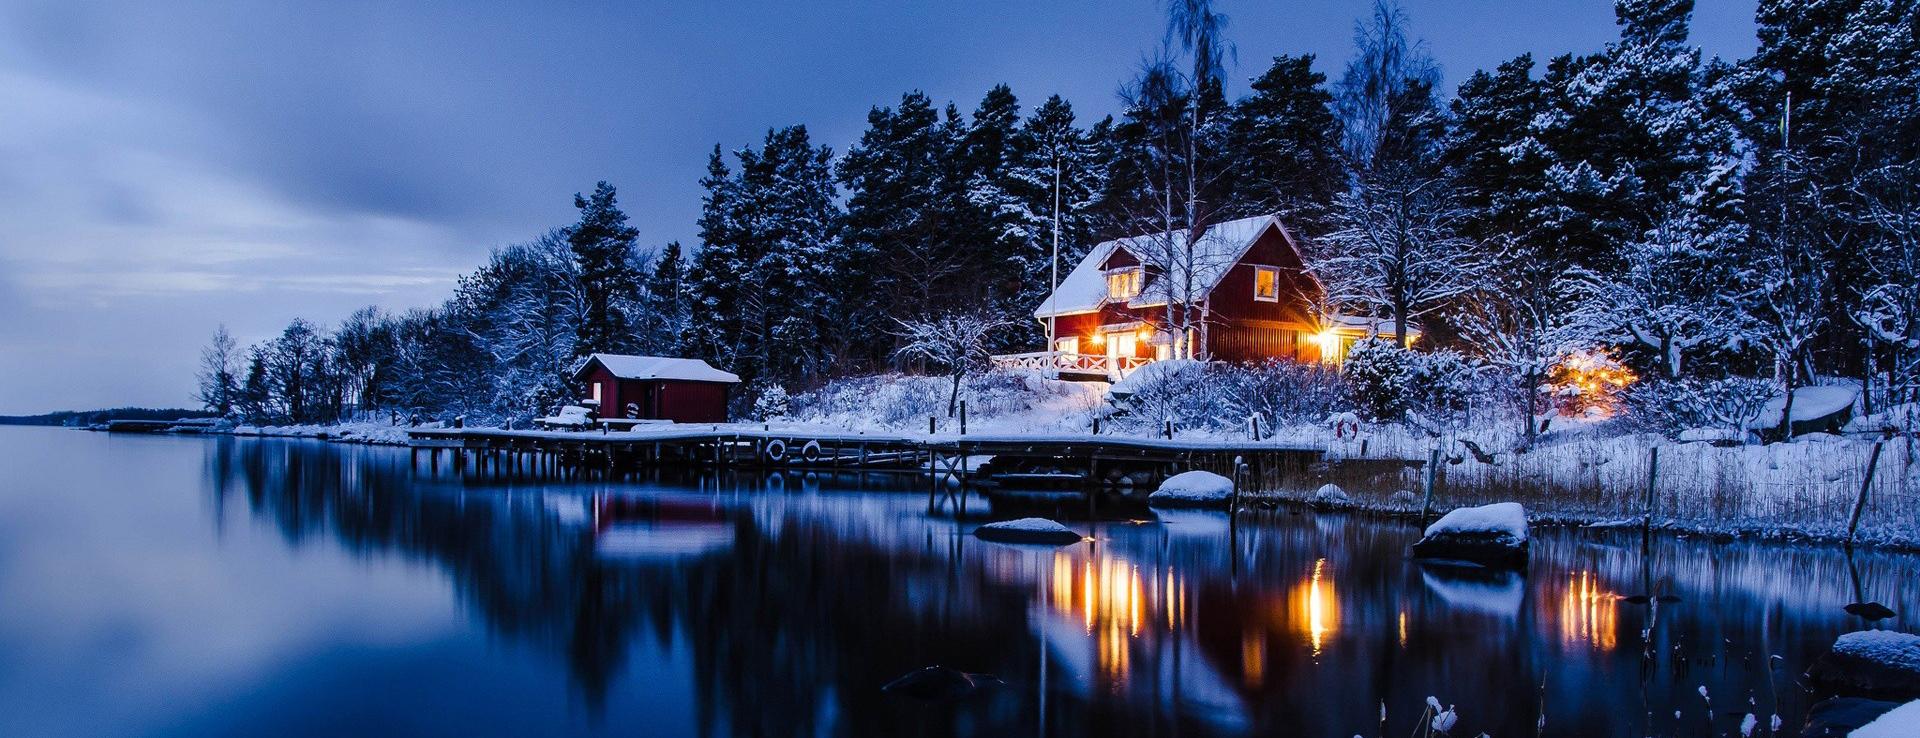 forest-houses-lights-snow-sweden-winter